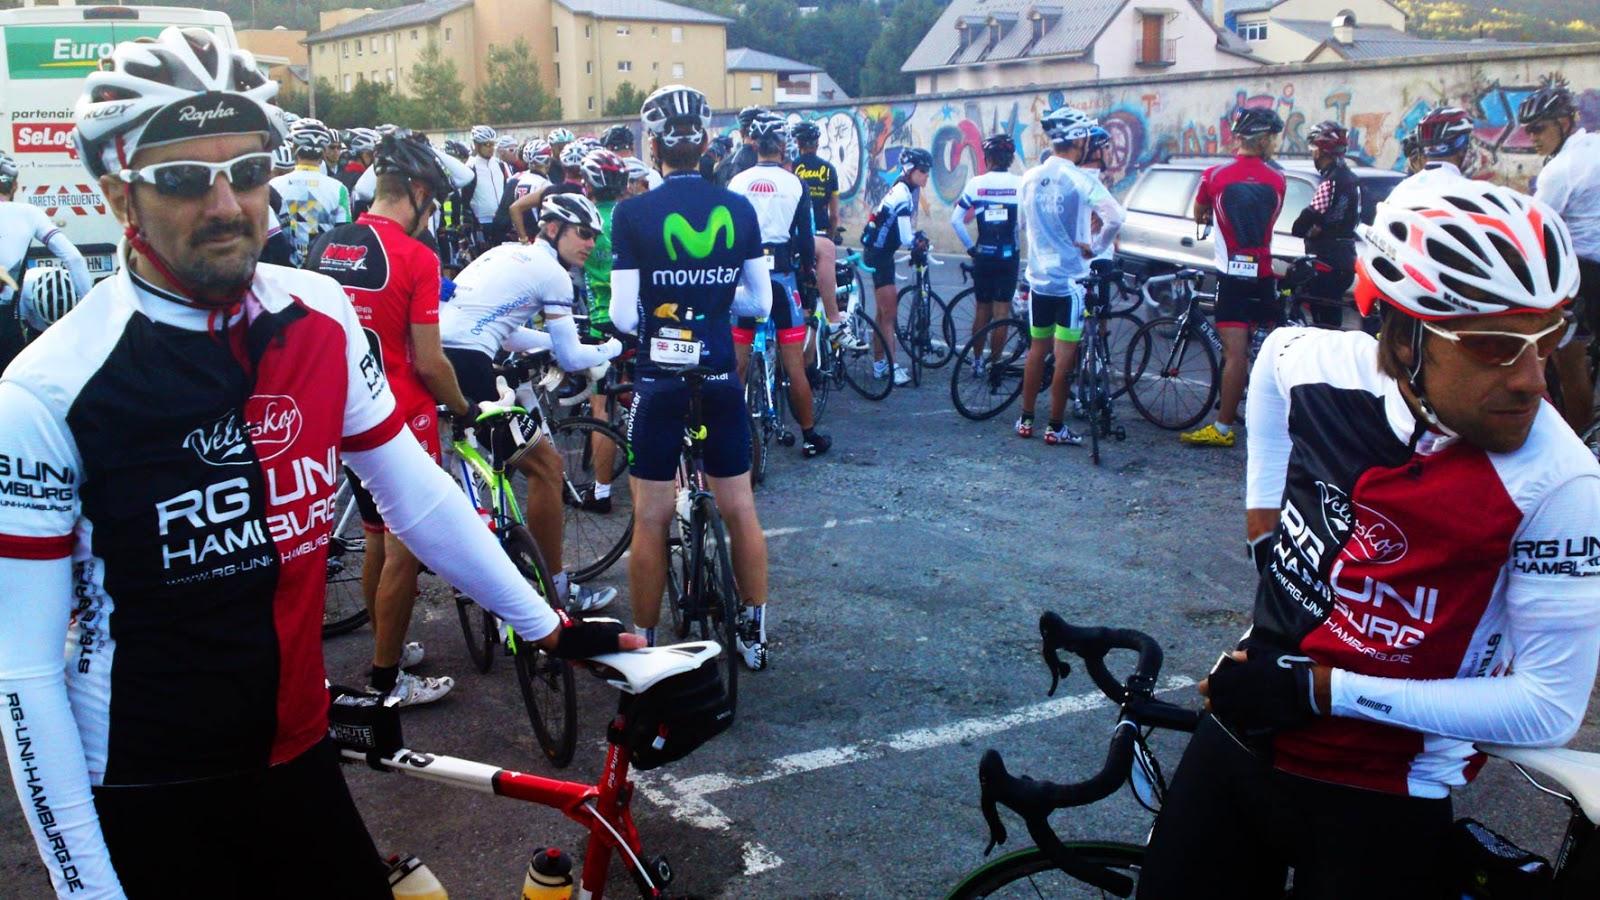 Lousy Legs - der Rennrad-Blog | Faszination Radsport: Etappe 4 ...